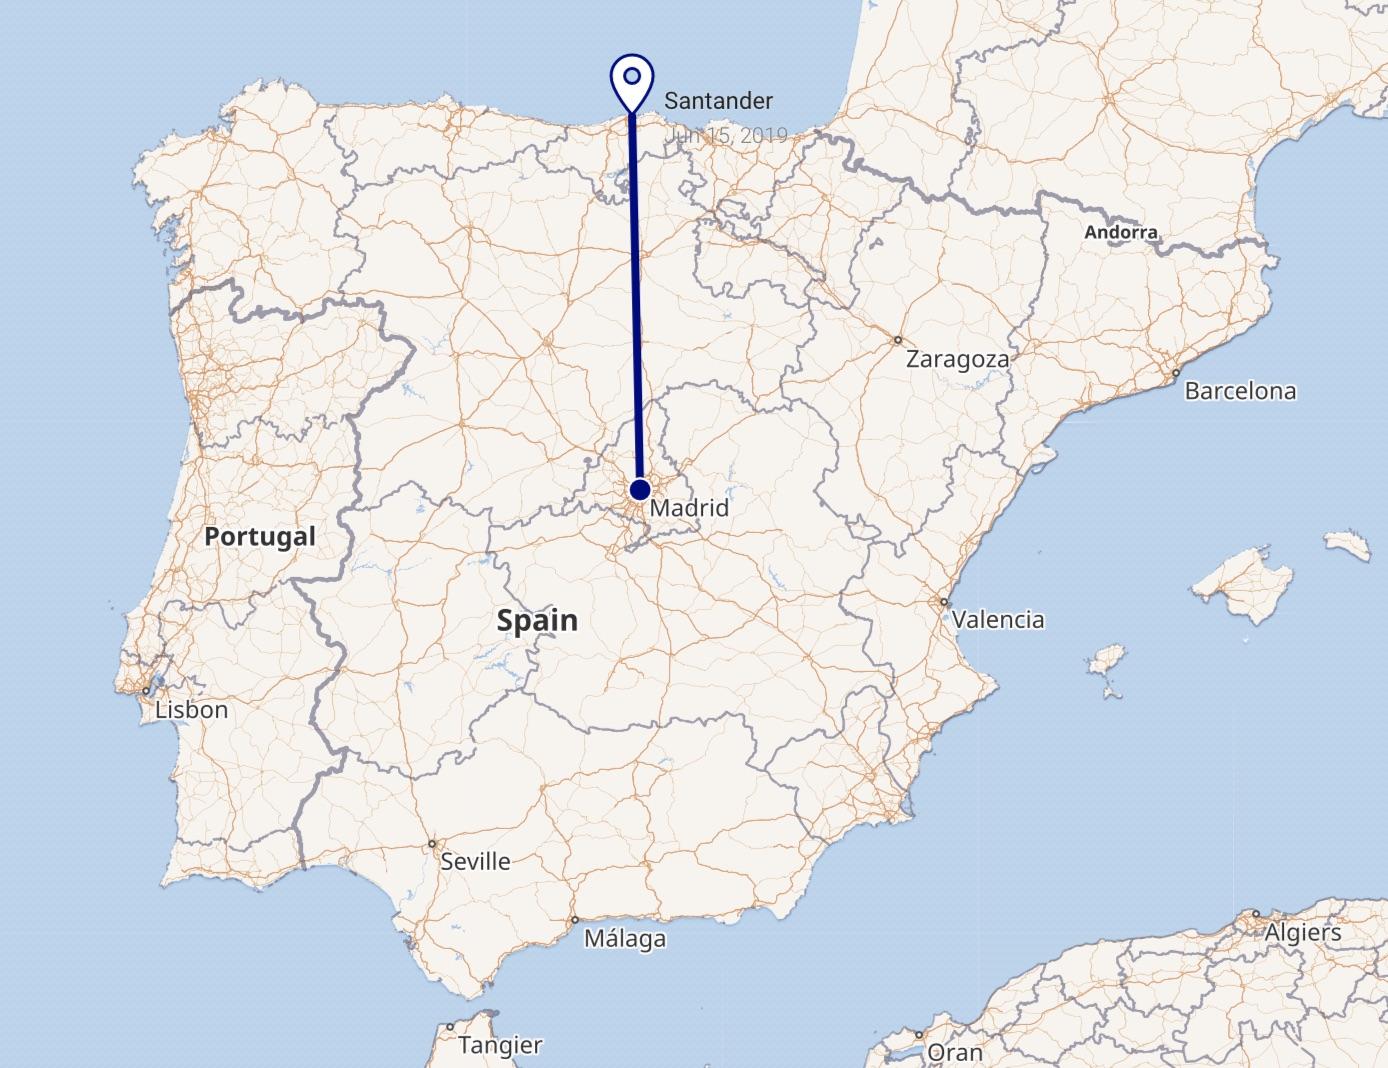 https://madrid.mattrossman.com/img/06/05/map.jpg not found